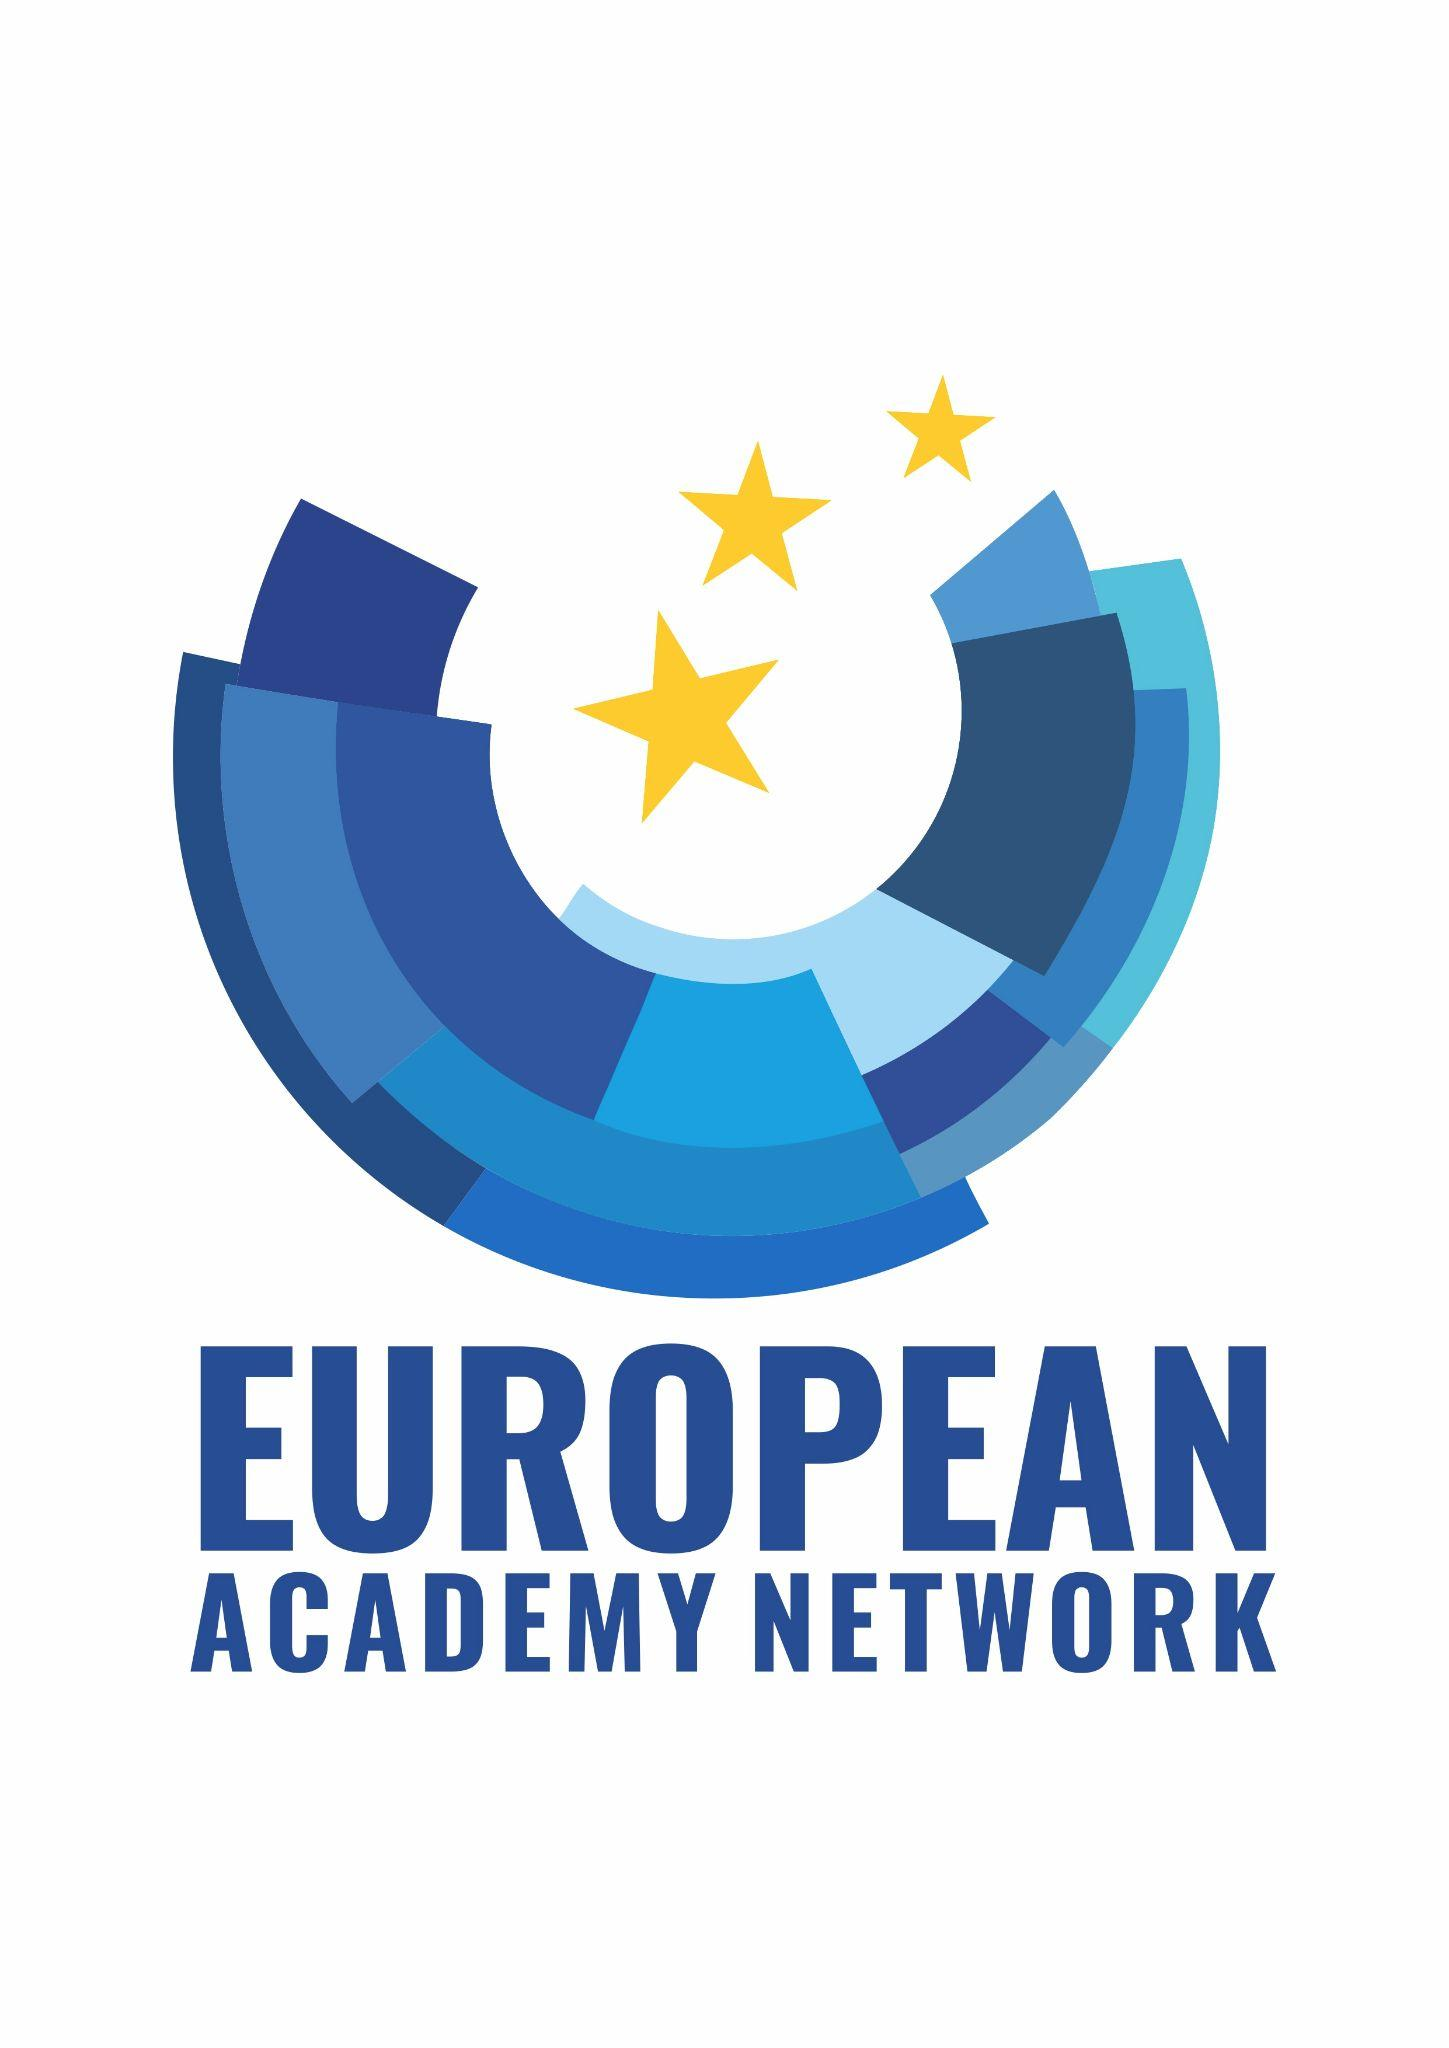 European Academy Network